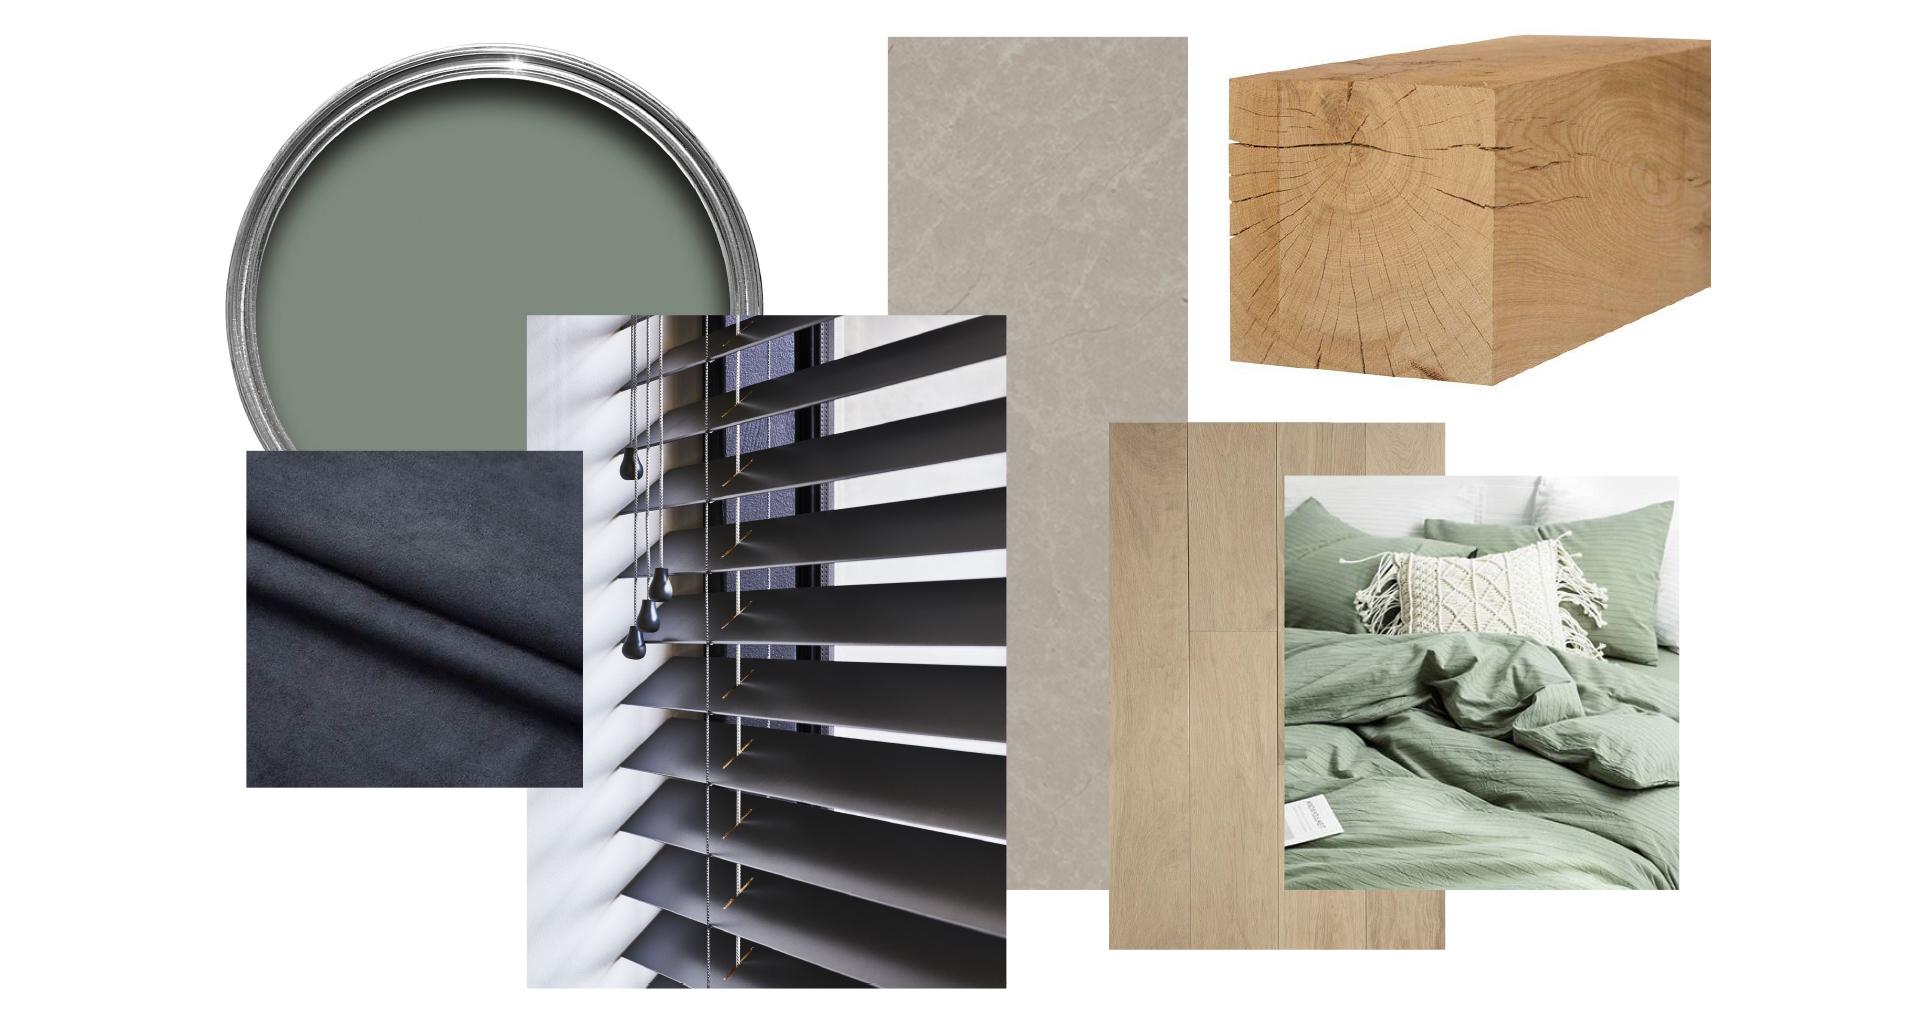 interieur moodboard sfeerbord natuurlijke materialen